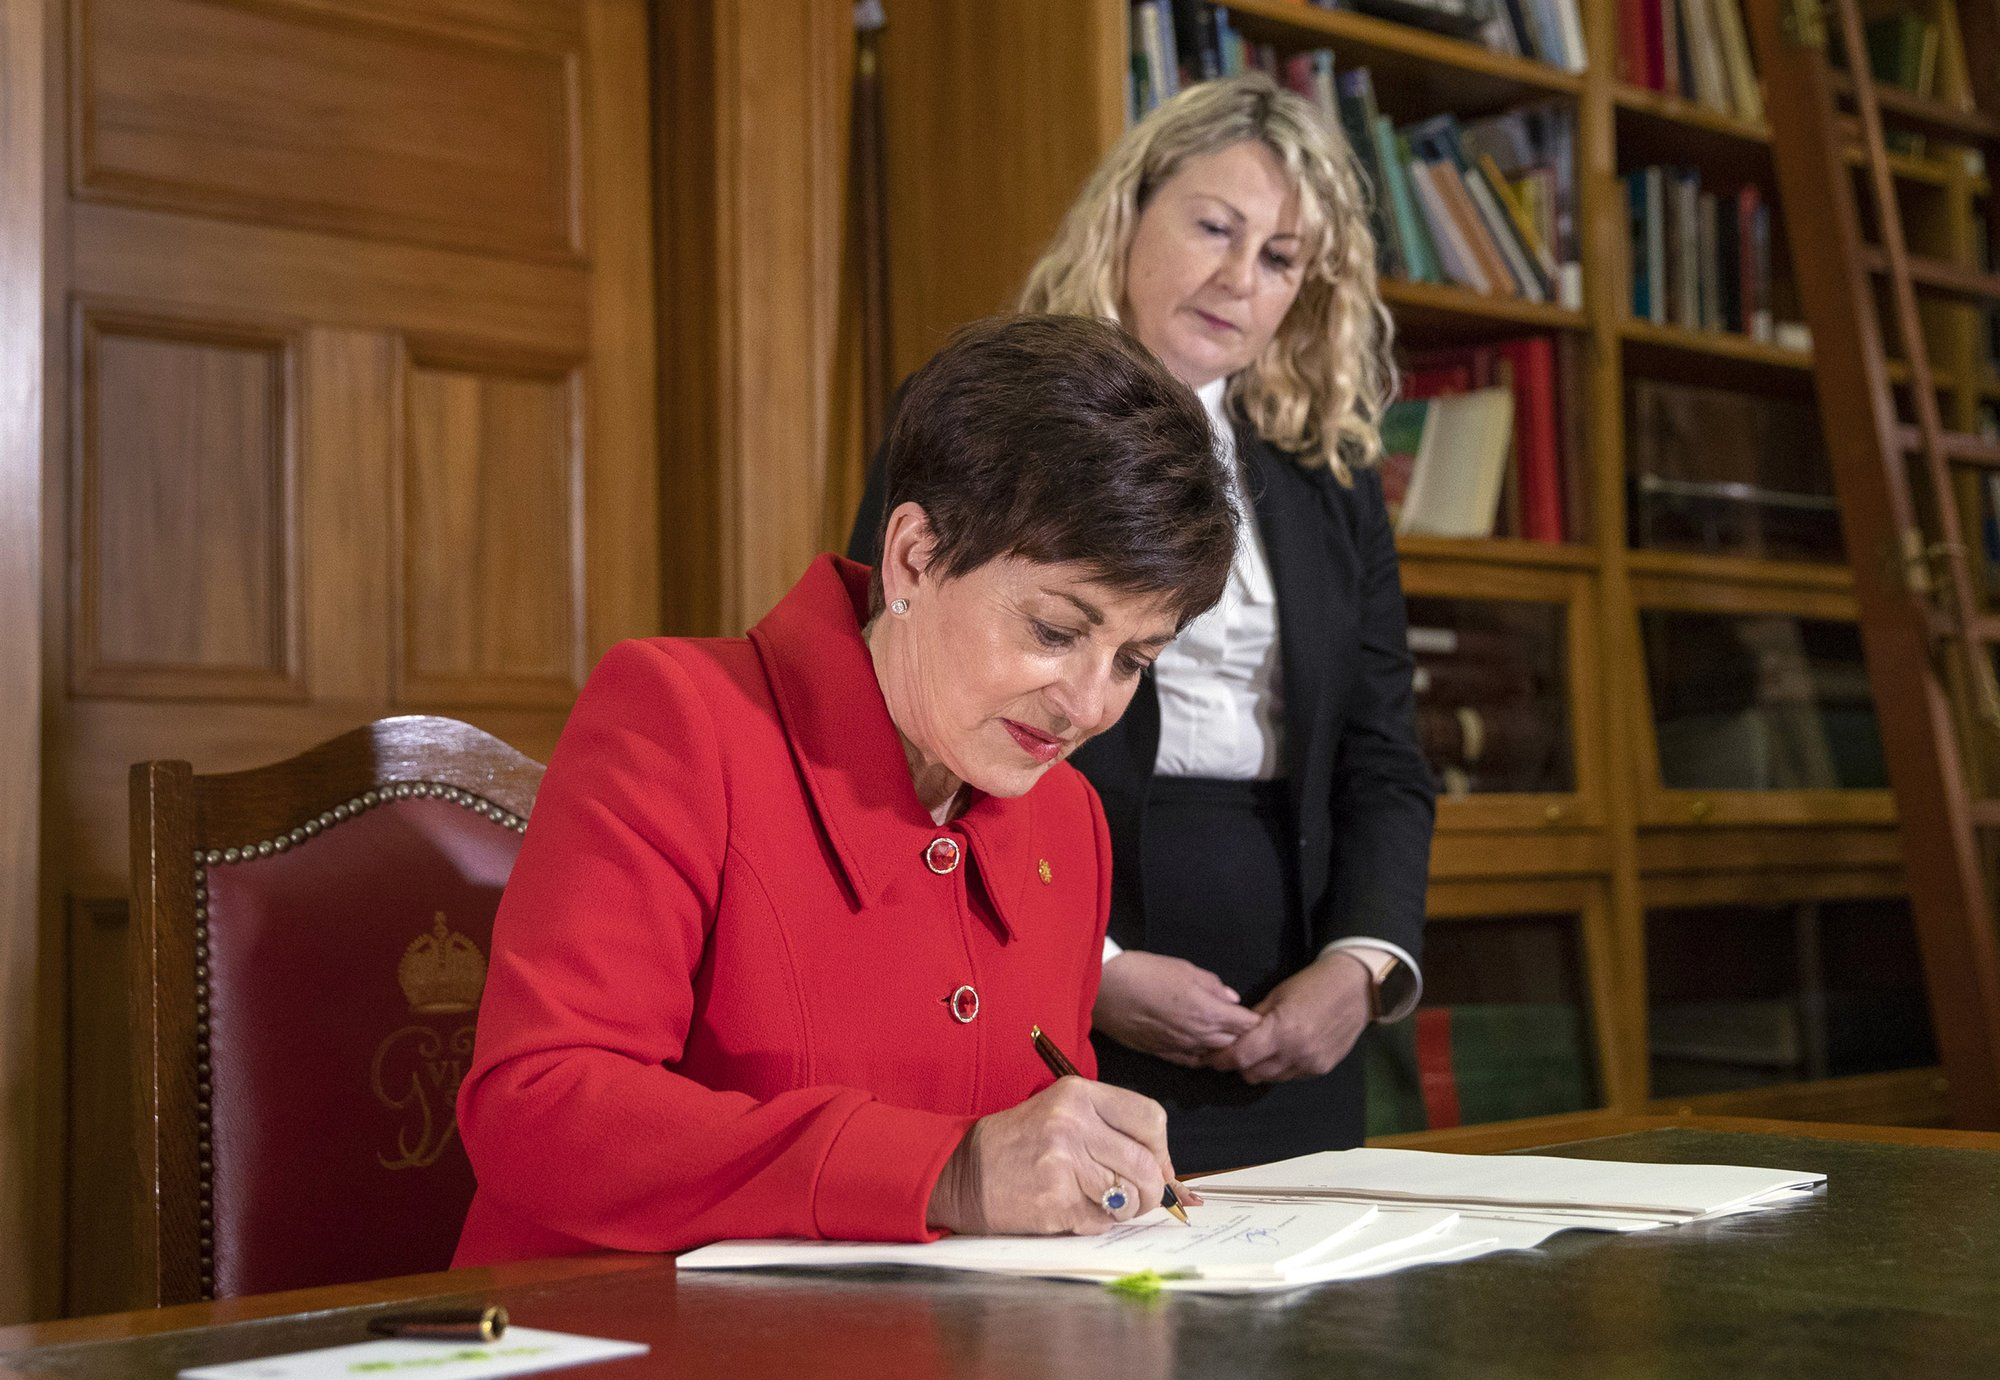 New Zealand's new gun laws get final assent to take effect